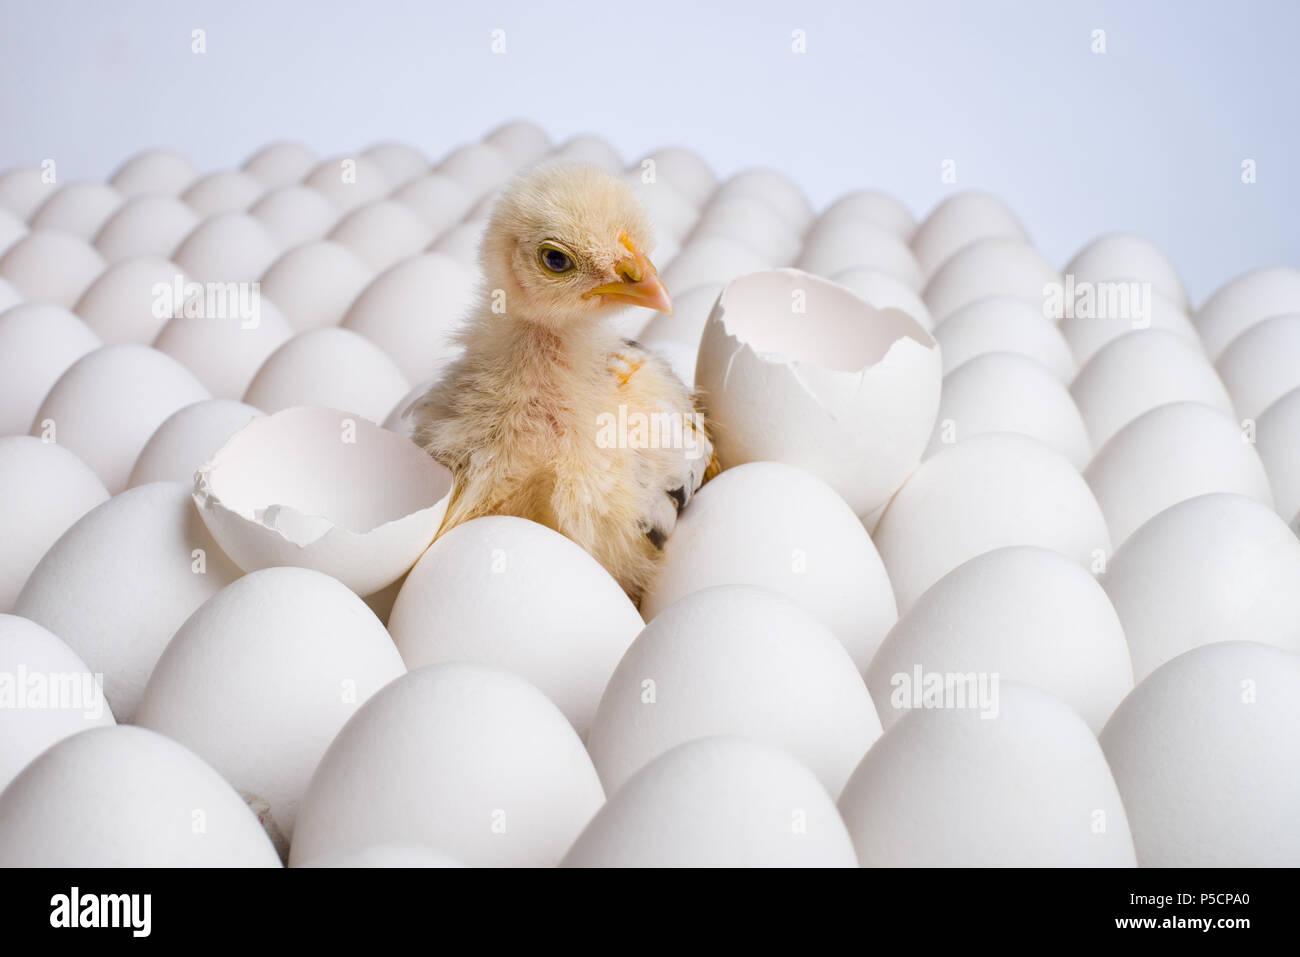 one yellow chicken nestling on many hen's-eggs, horizontal photo - Stock Image